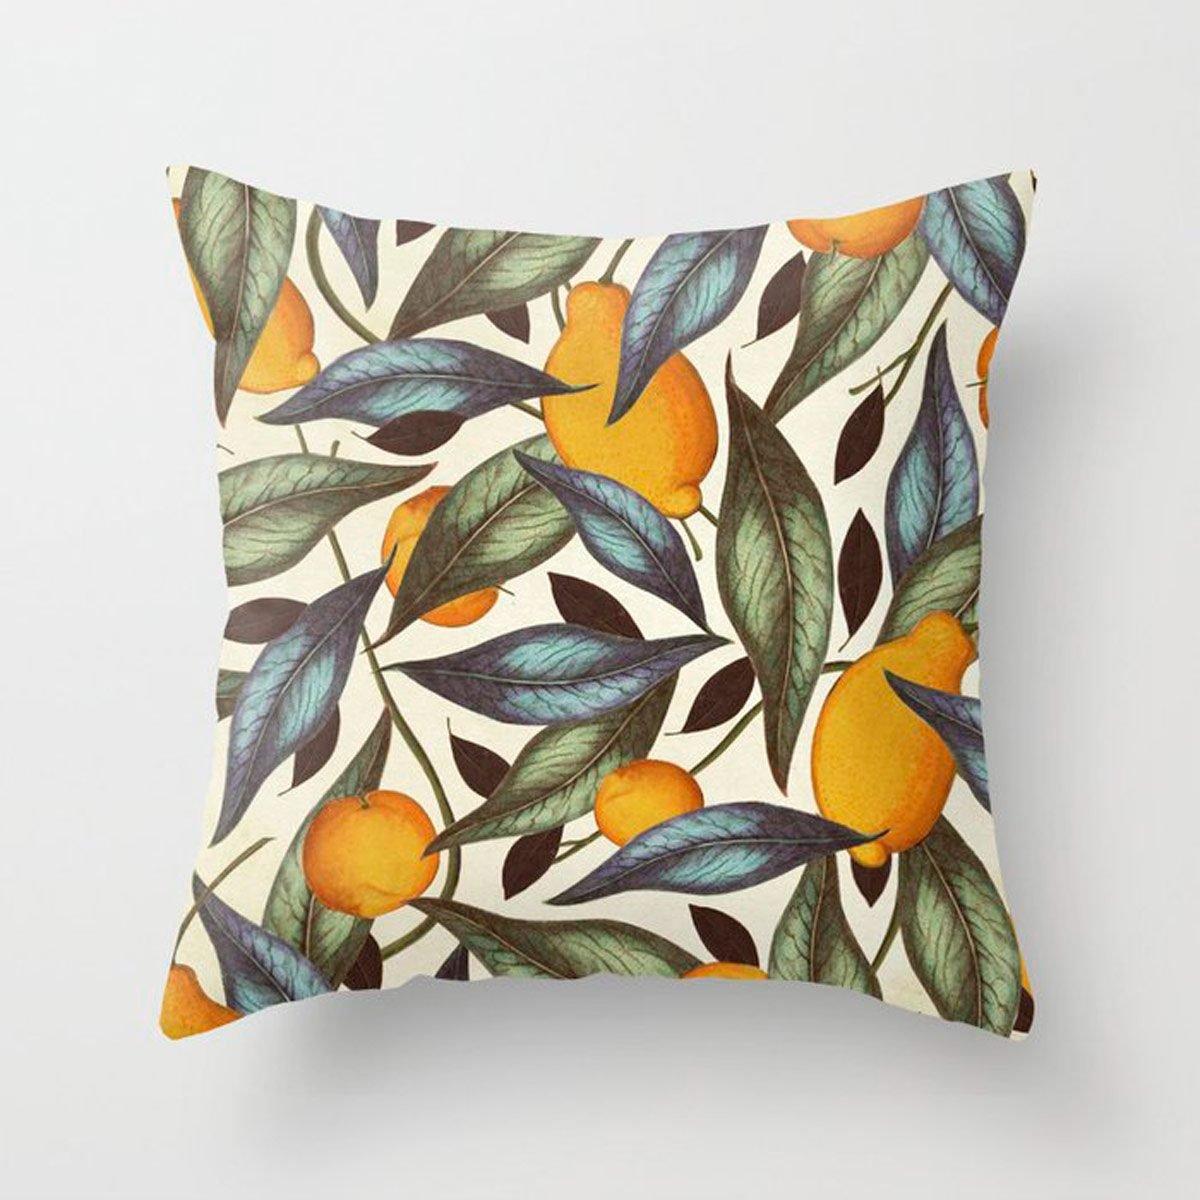 lemons-oranges-pears-pillows